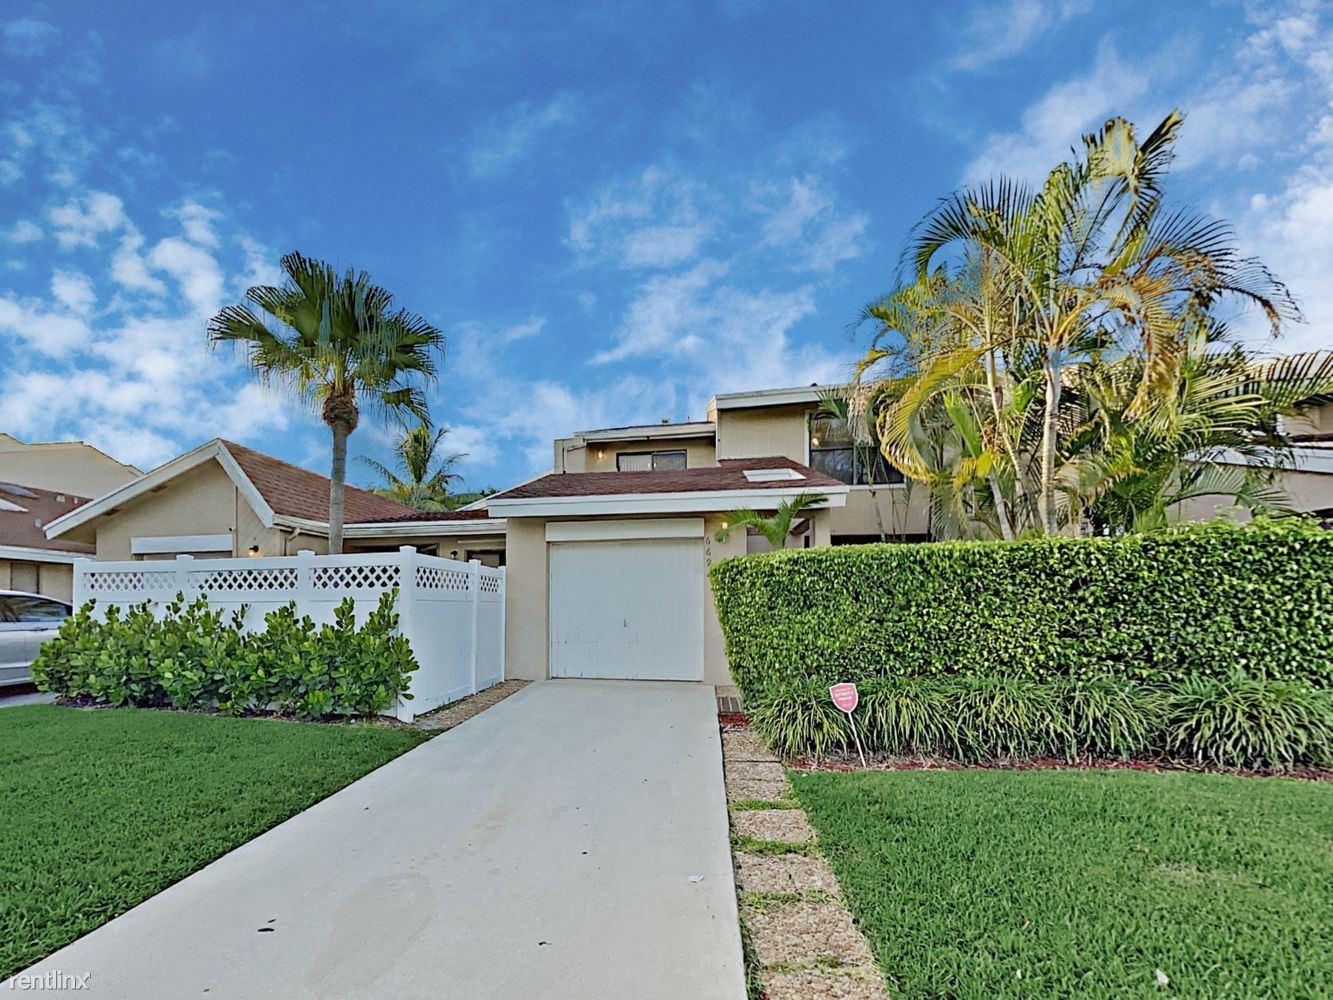 6692 Canary Palm Cir, Boca Raton, FL - $2,470